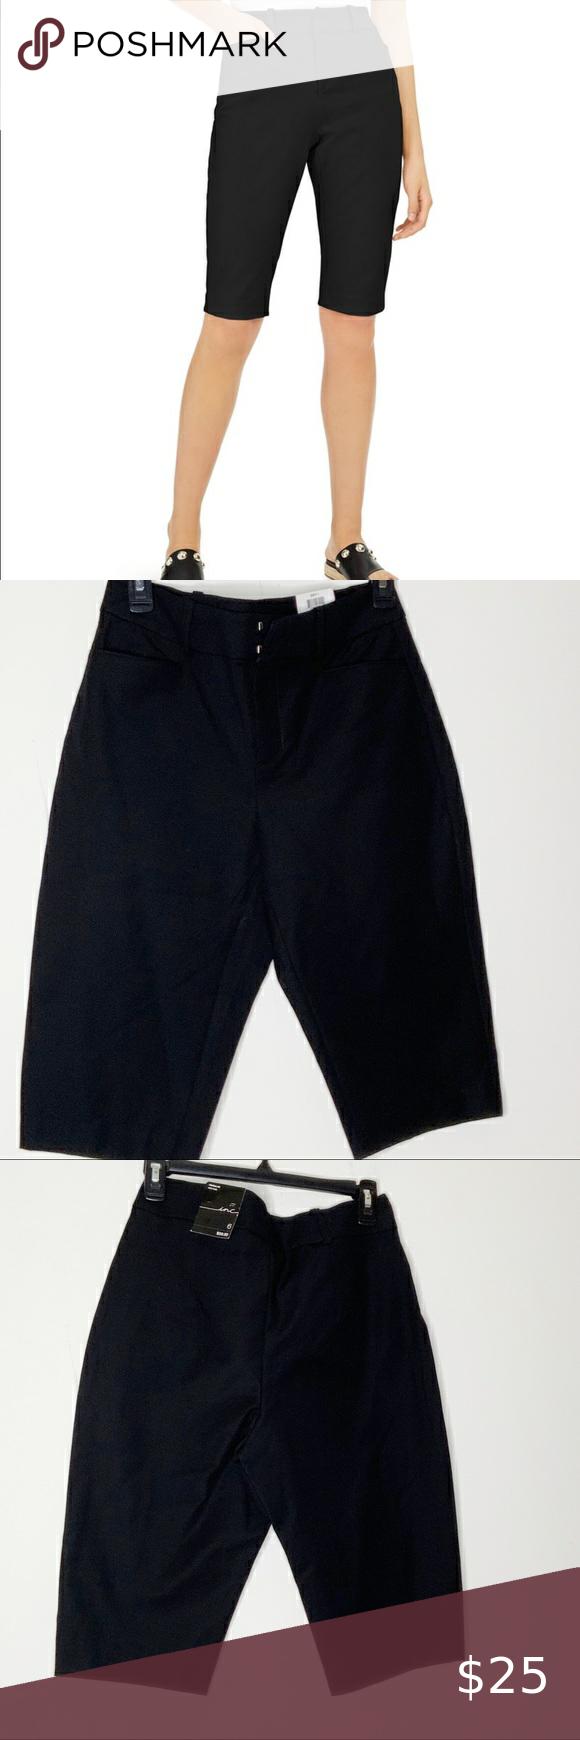 Inc Black Brit 1 Dress Shorts Size 6 Short Dresses Black Short Dress Clothes Design [ 1740 x 580 Pixel ]